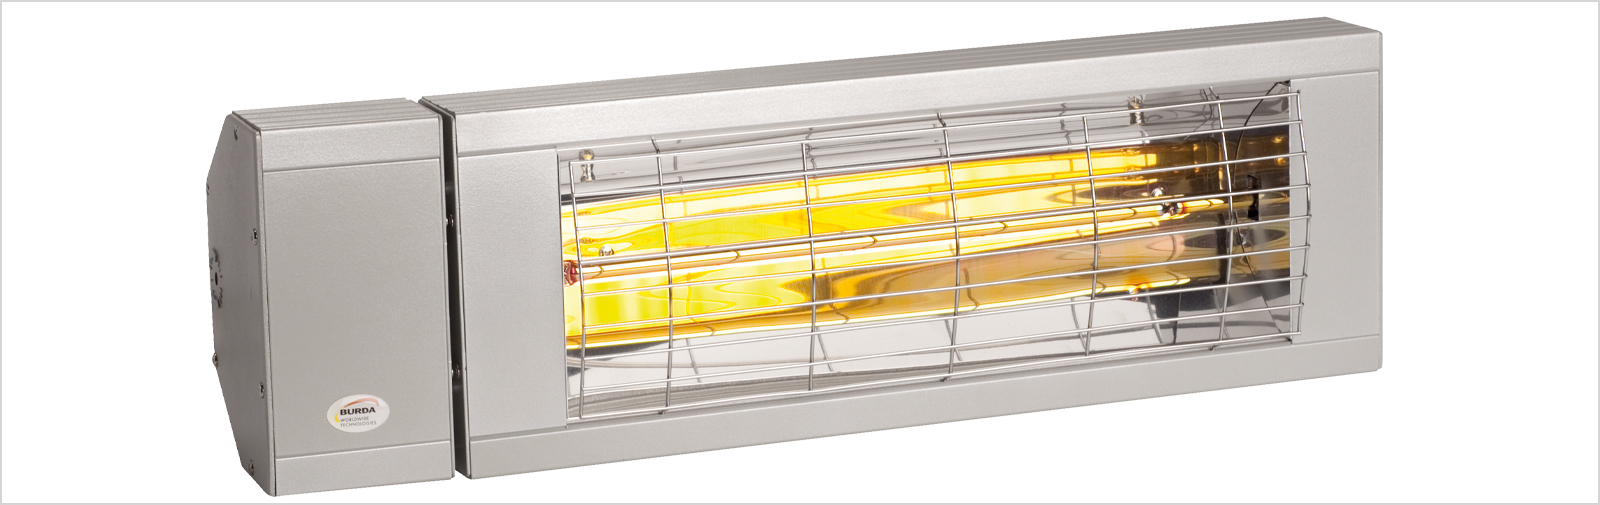 infrared radiant heater IP24